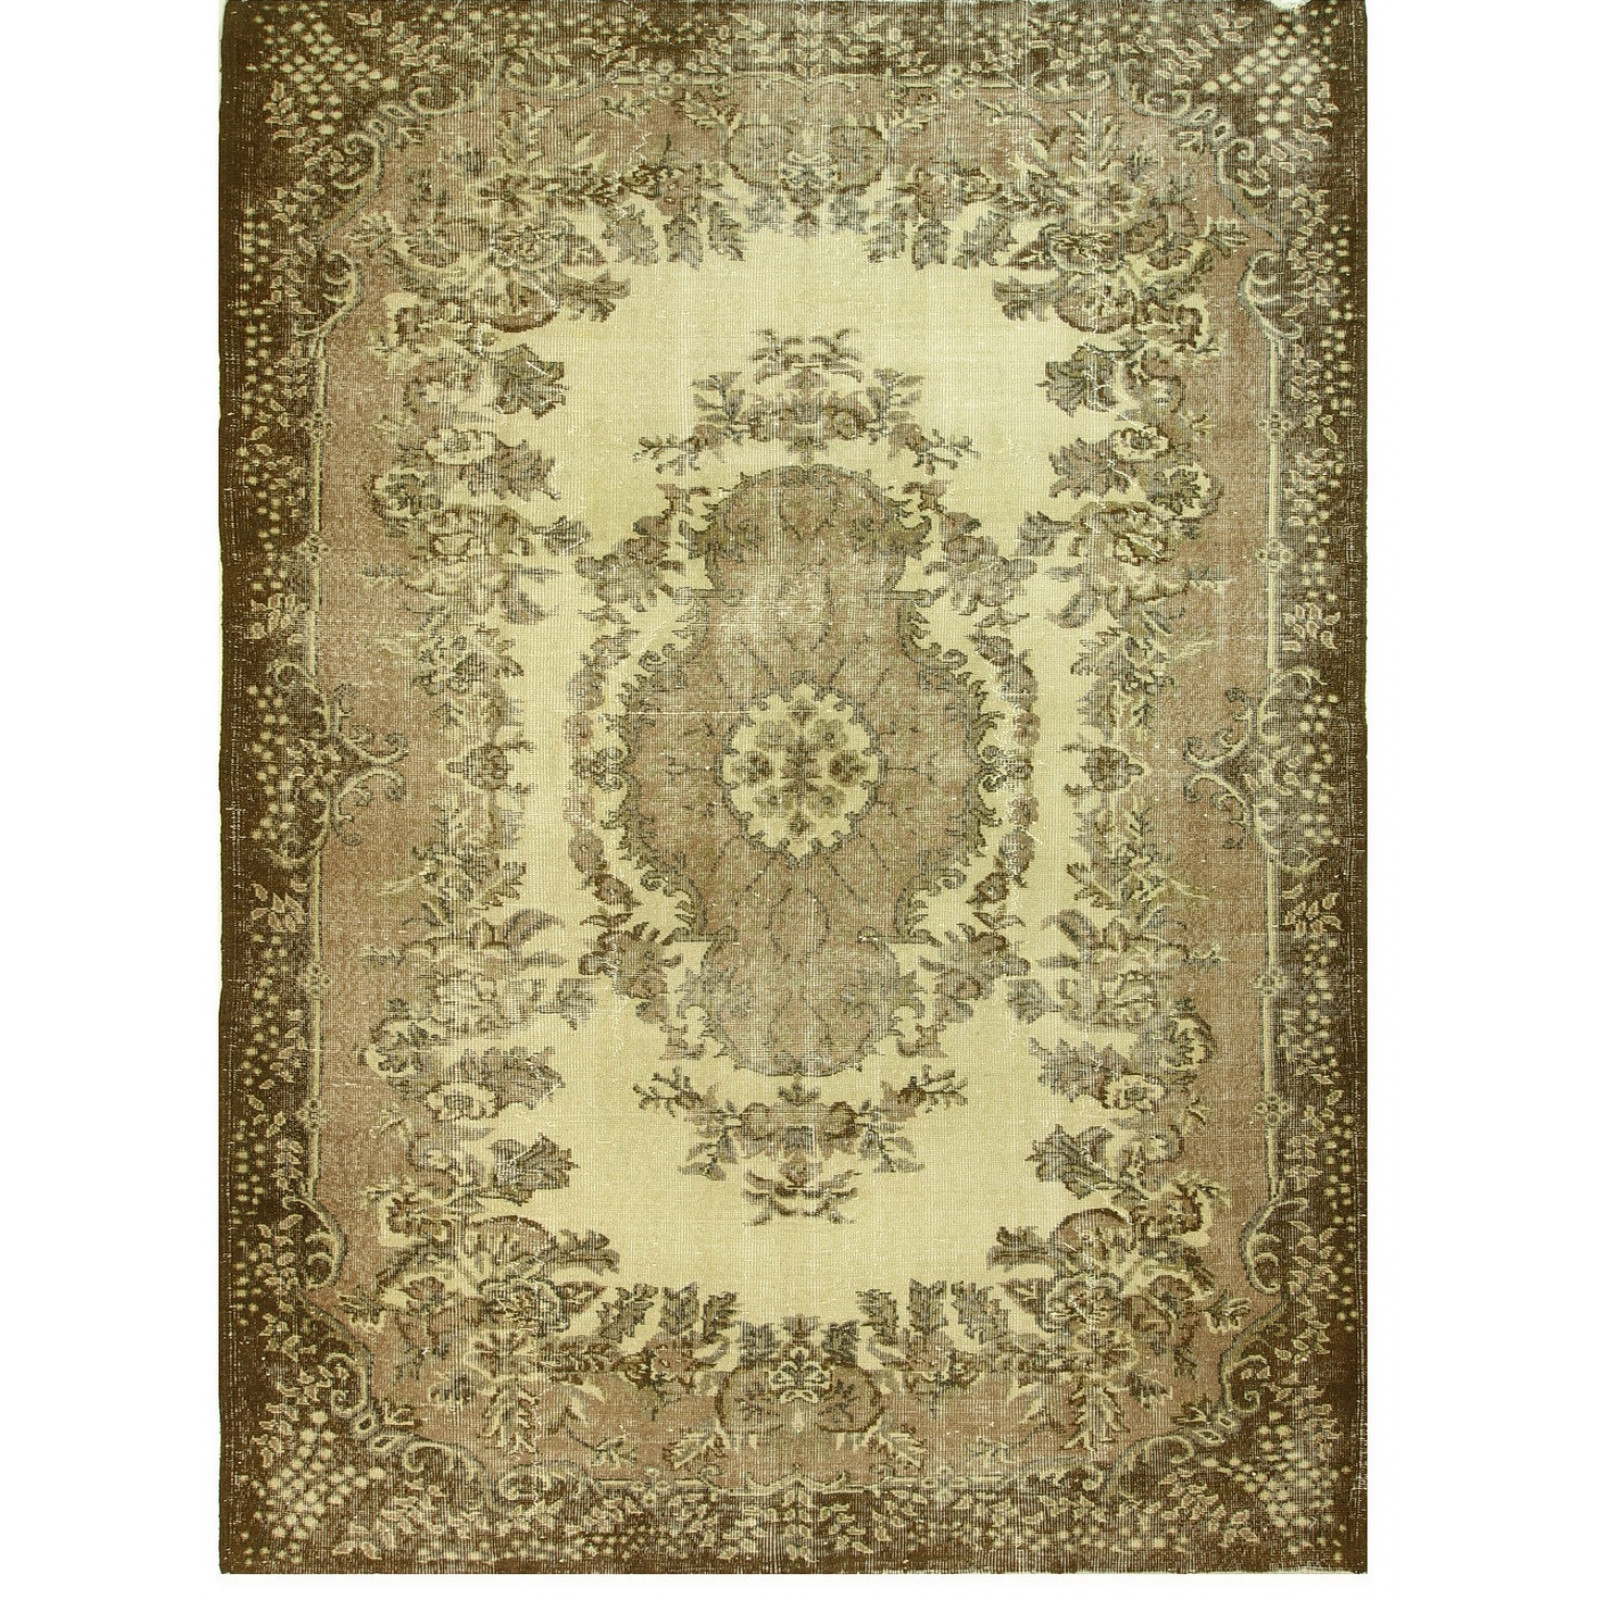 Natural Color Vintage Carpets